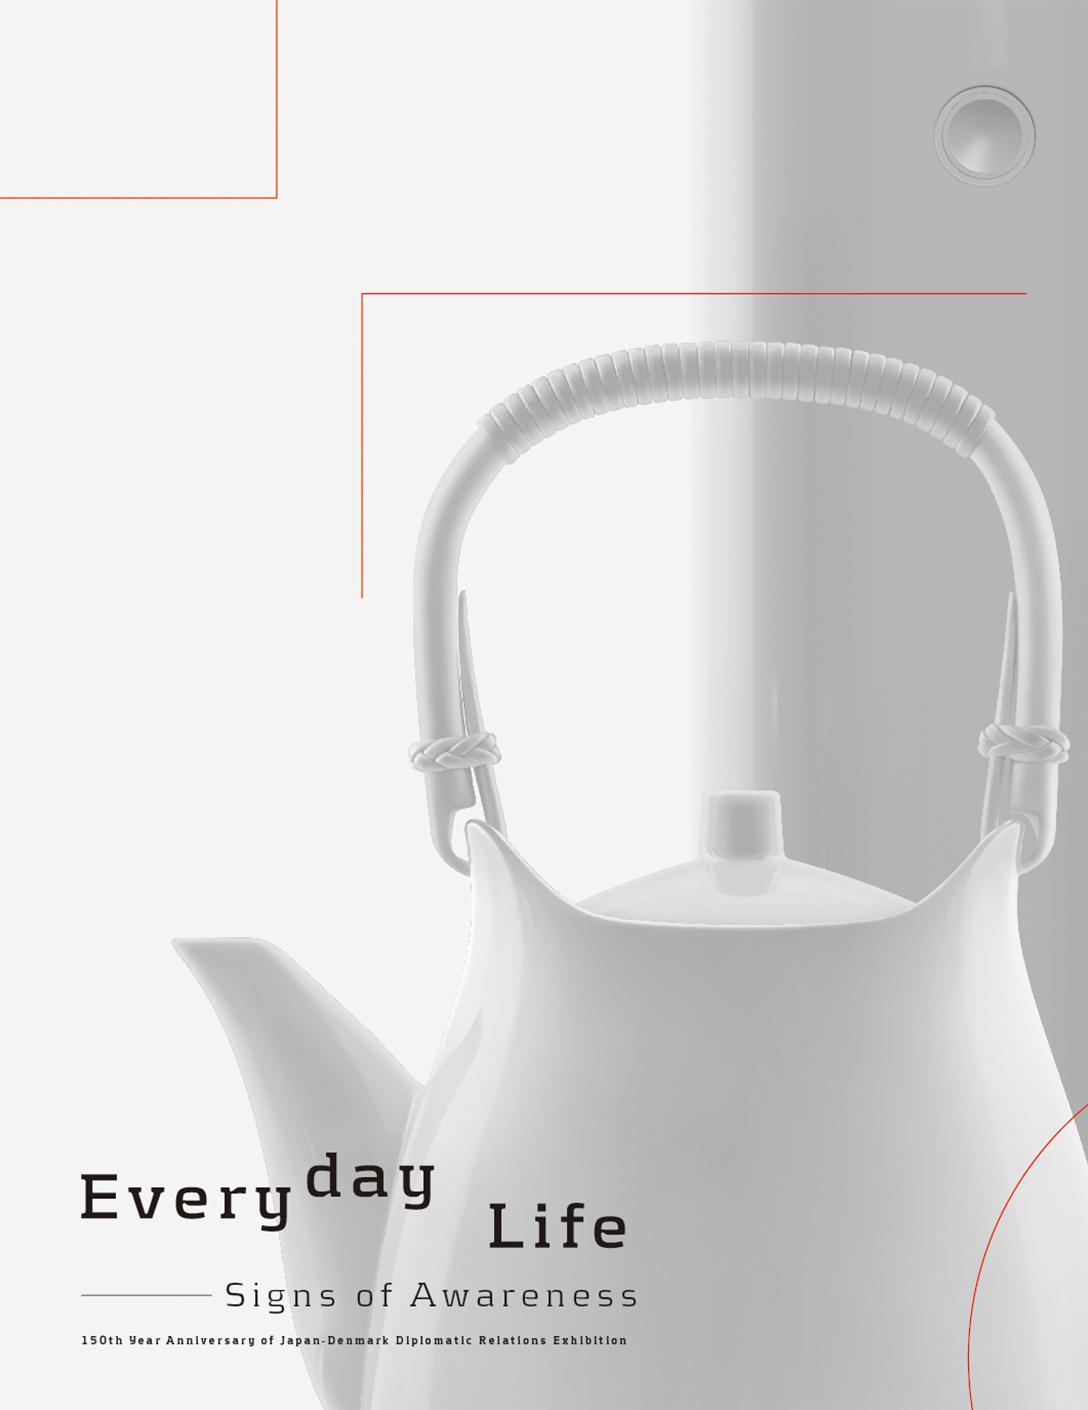 日常的生活-领会的标记 Everyday Life–Signs of Awareness